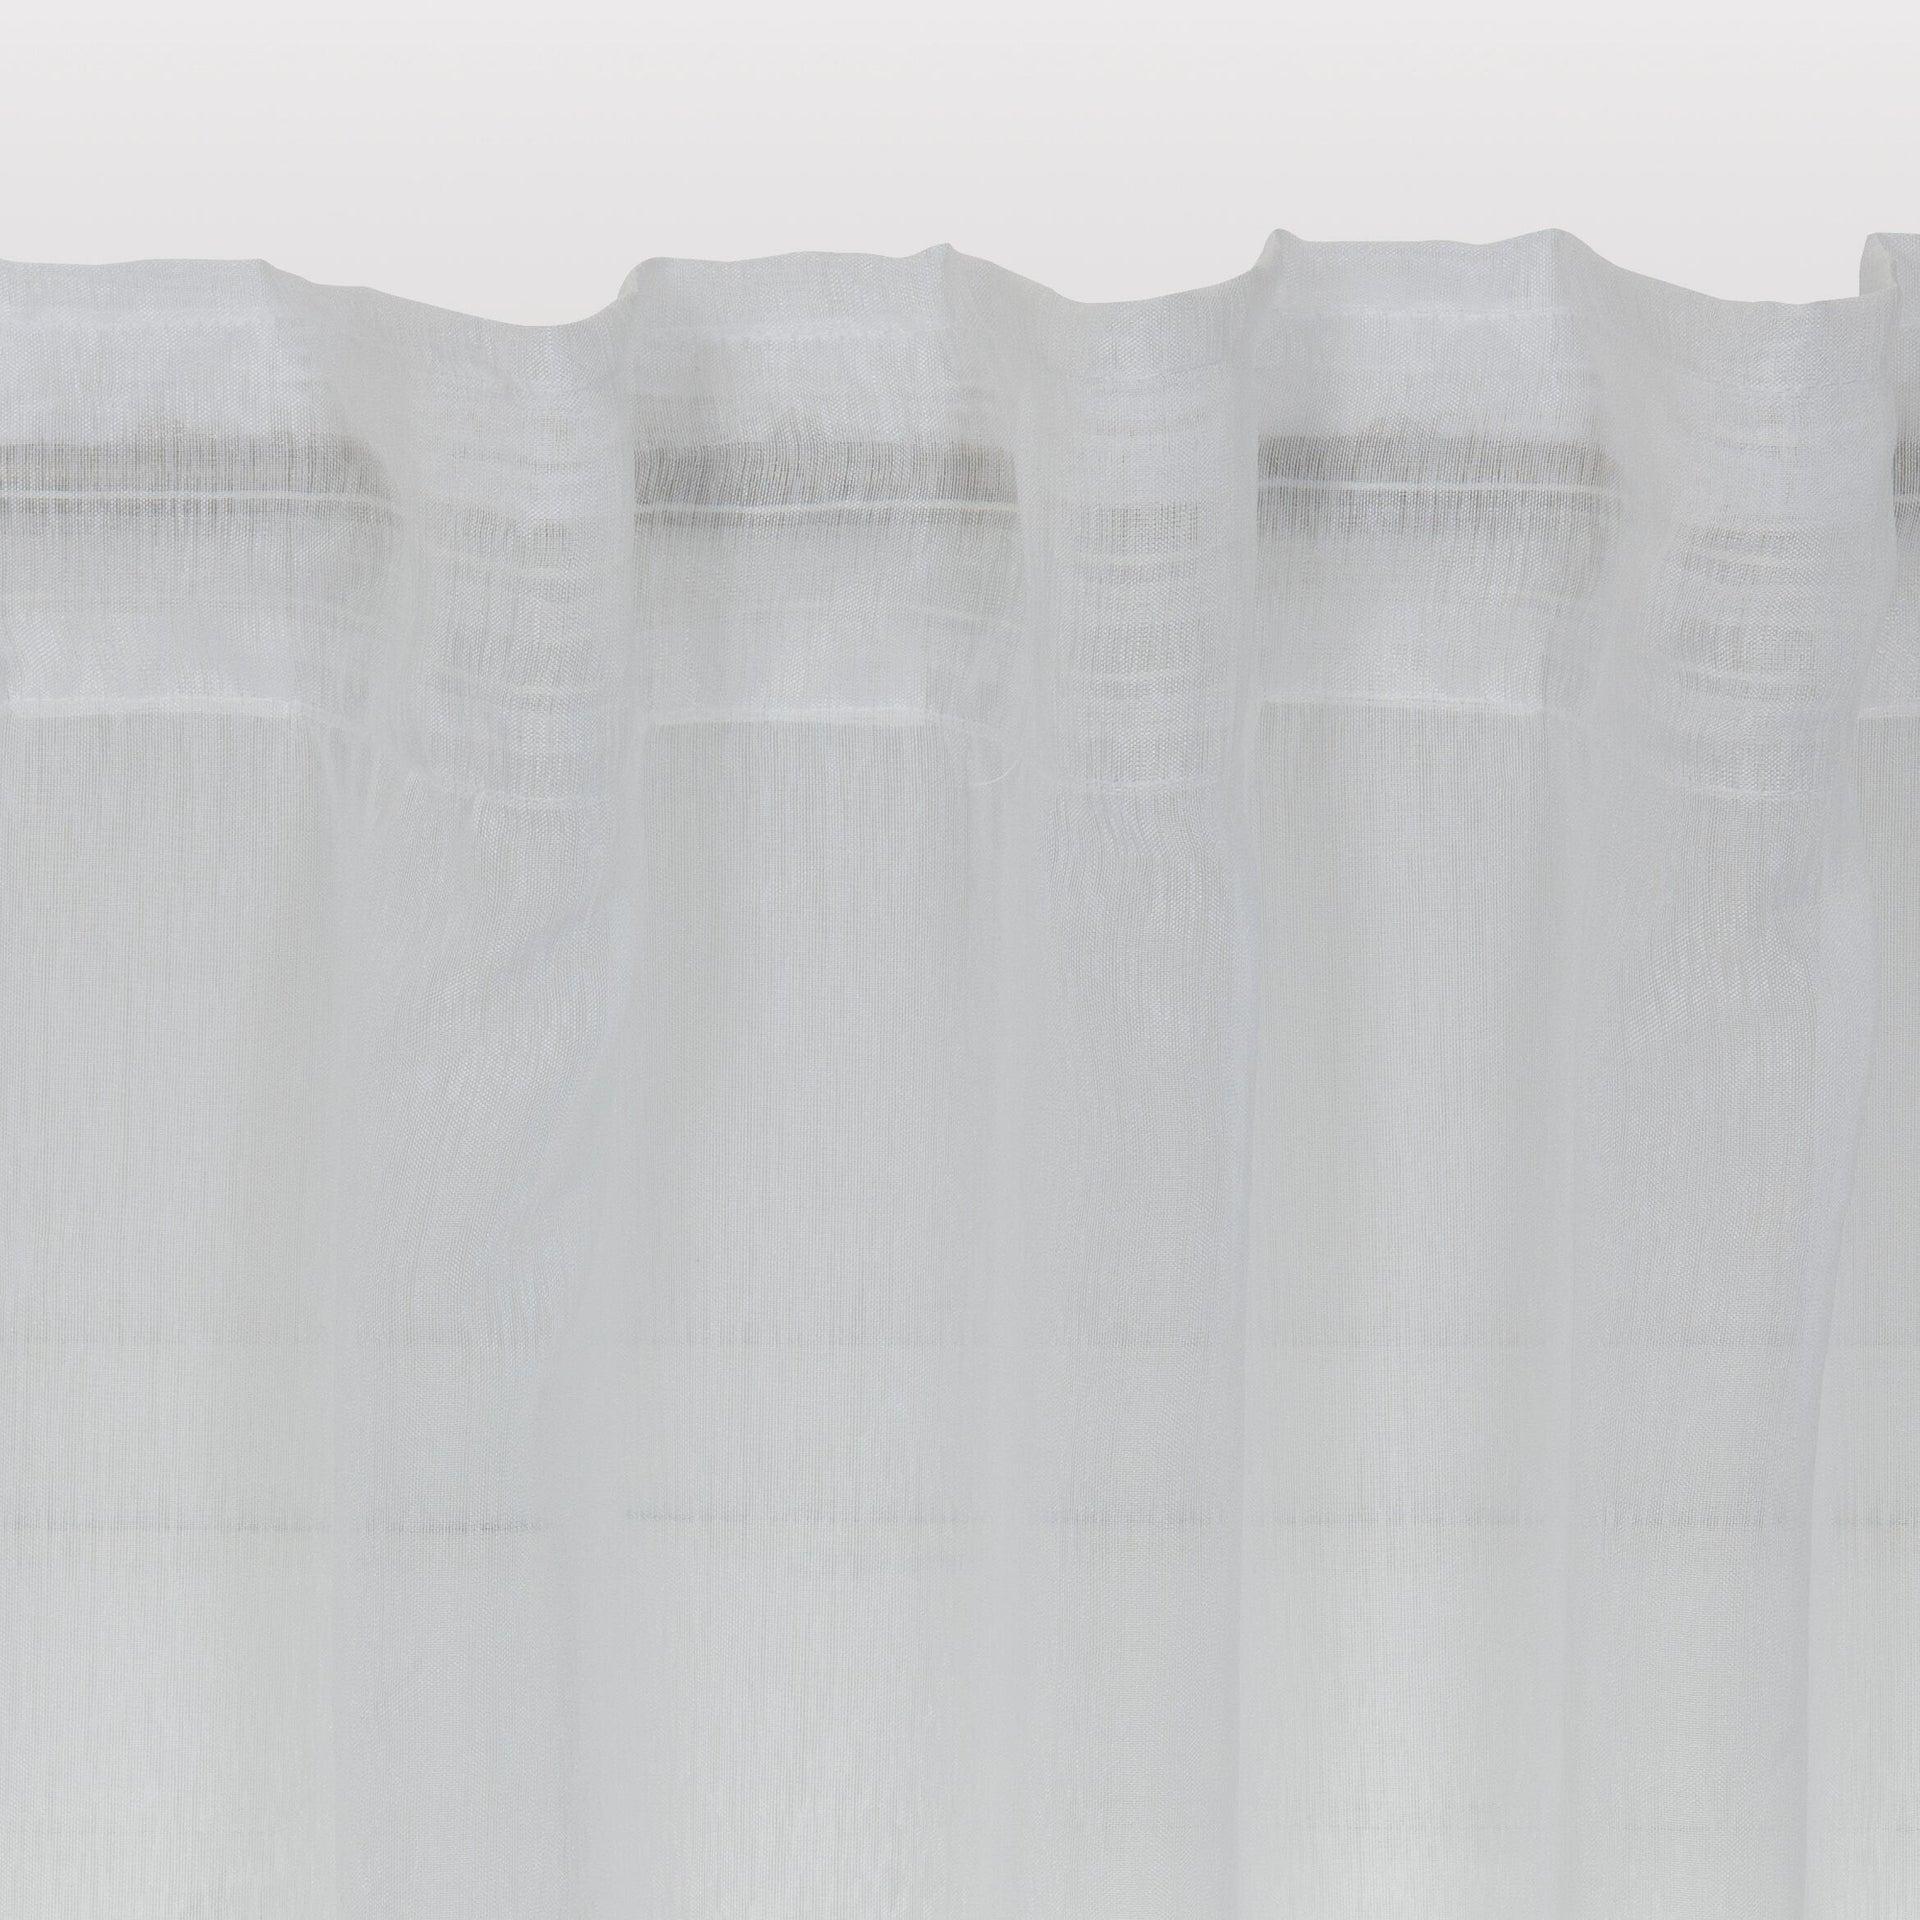 Tenda INSPIRE Softy bianco fettuccia e passanti 200 x 280 cm - 3